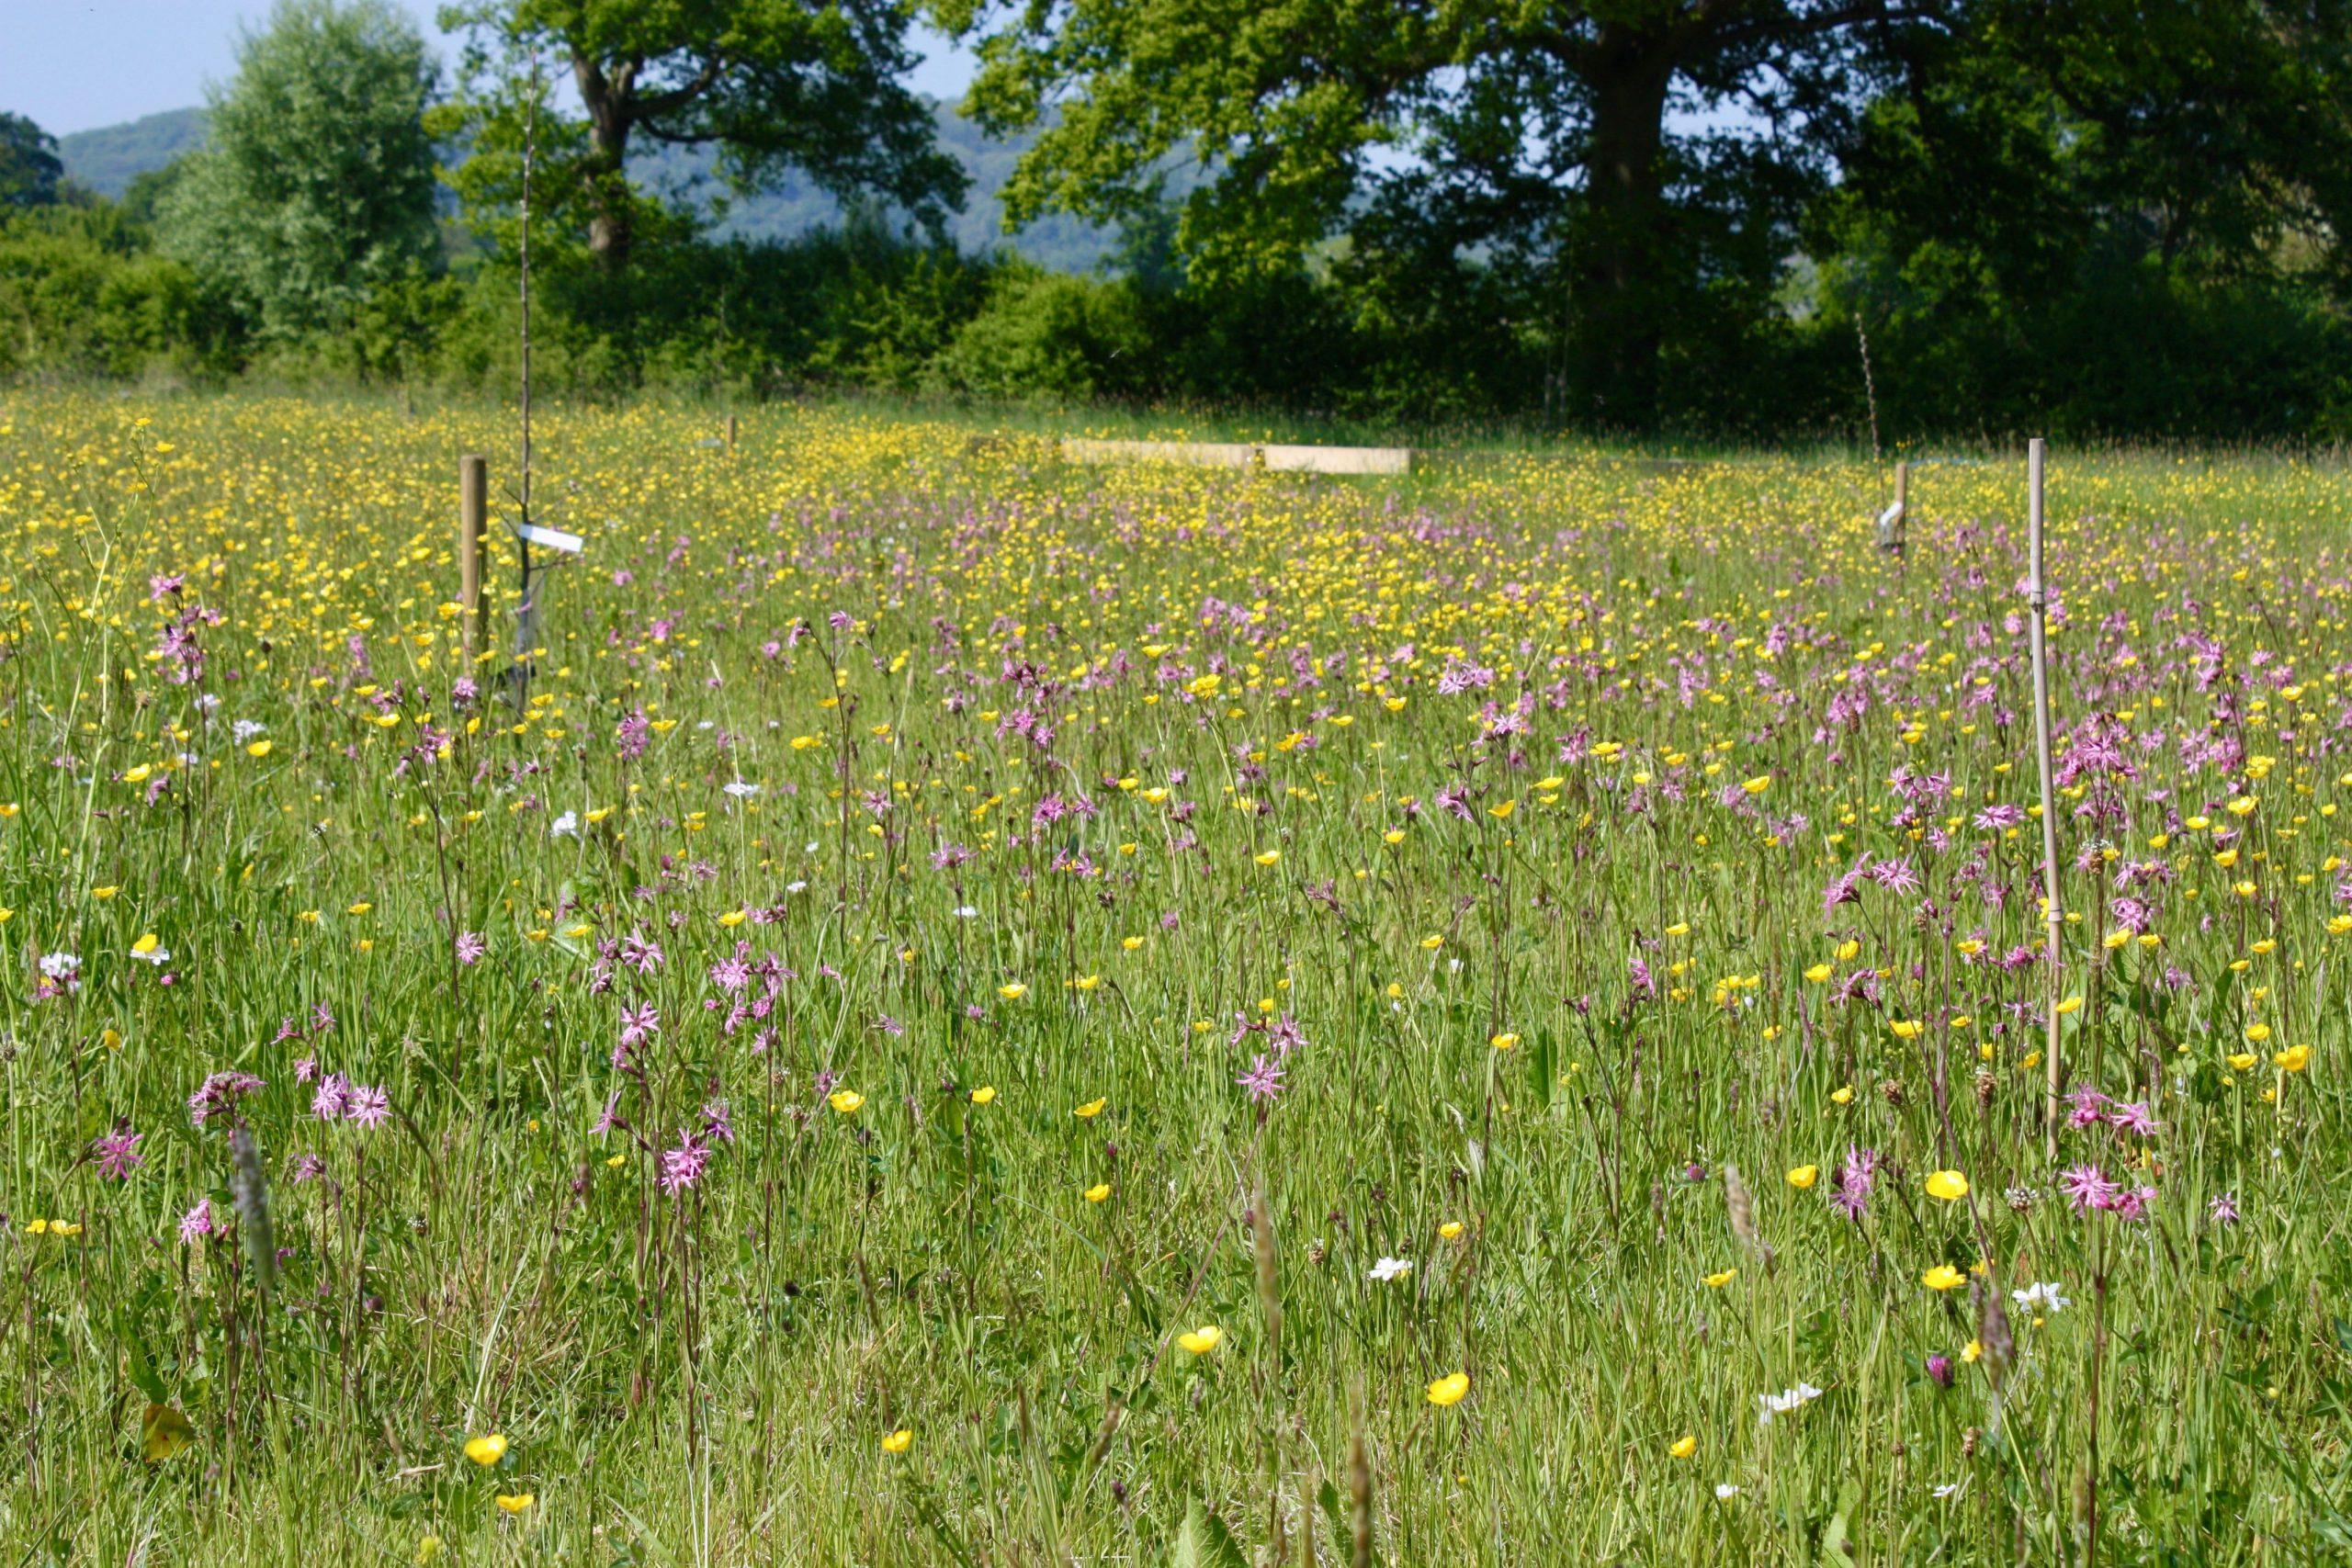 The wildflower meadow in bloom